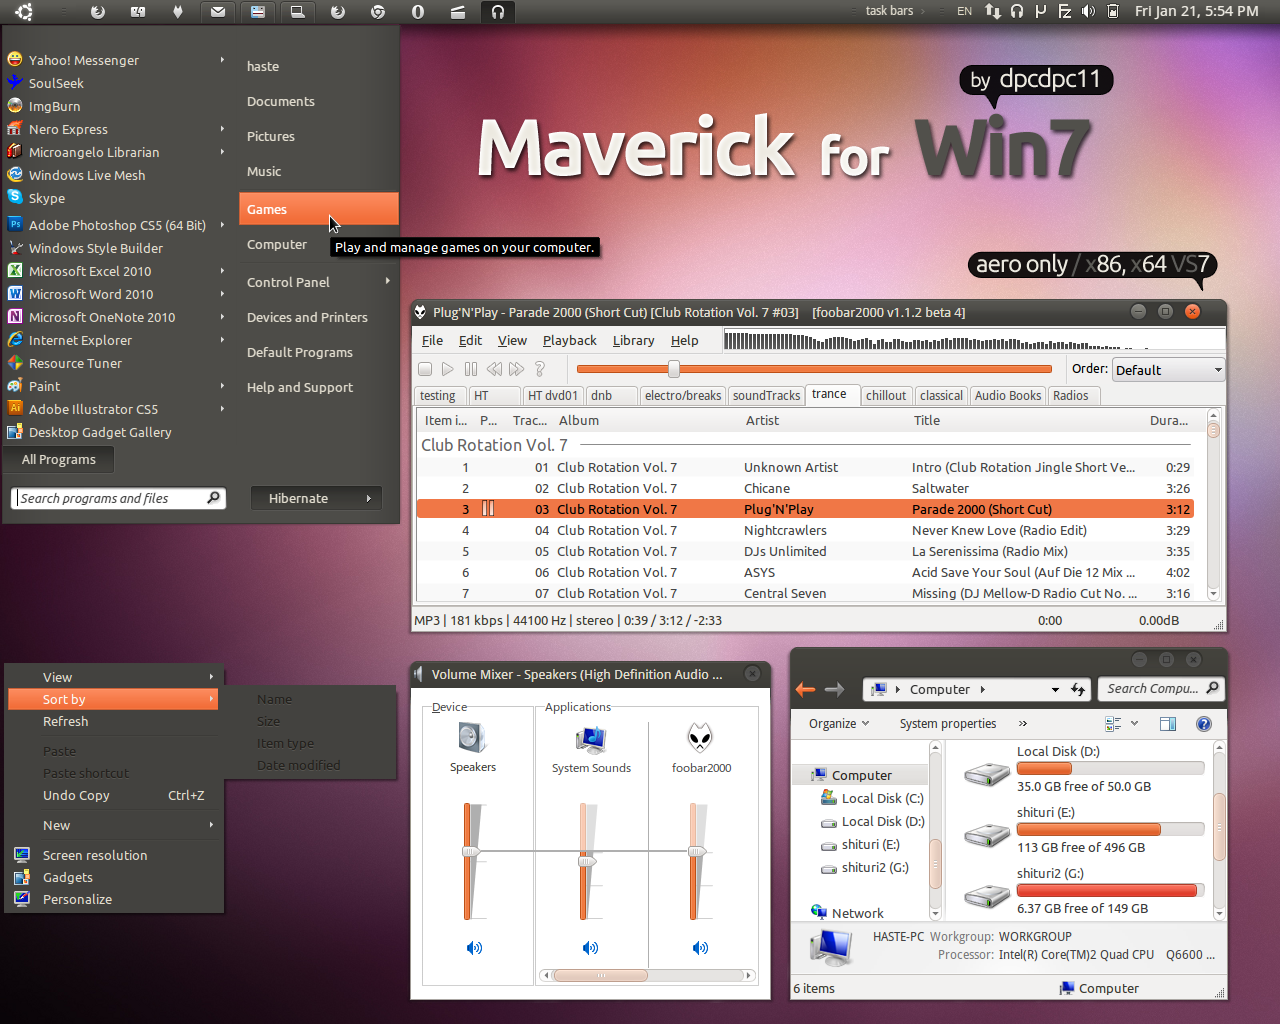 Maverick for Win7 by dpcdpc11